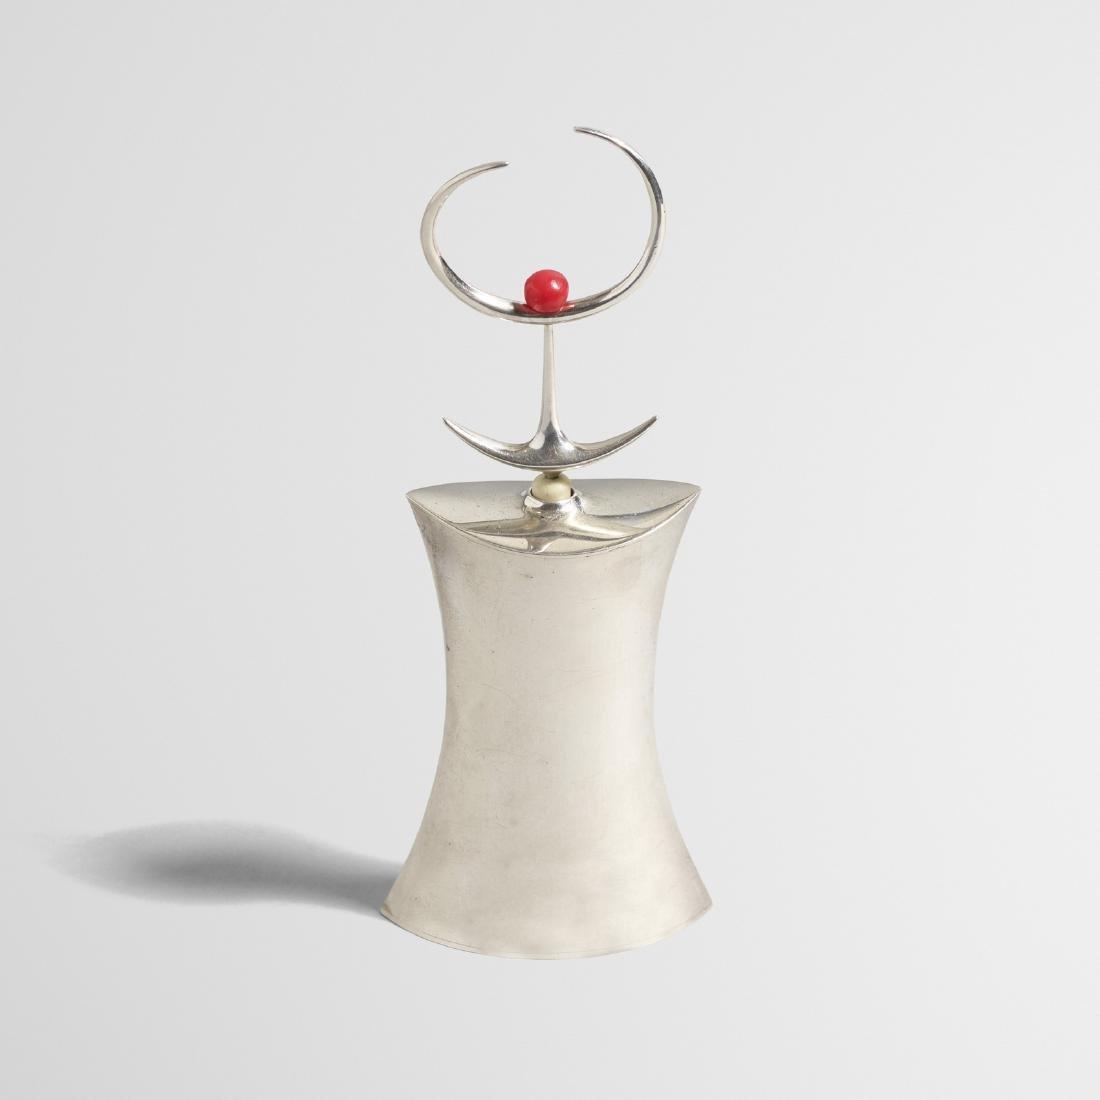 John Prip, perfume bottle